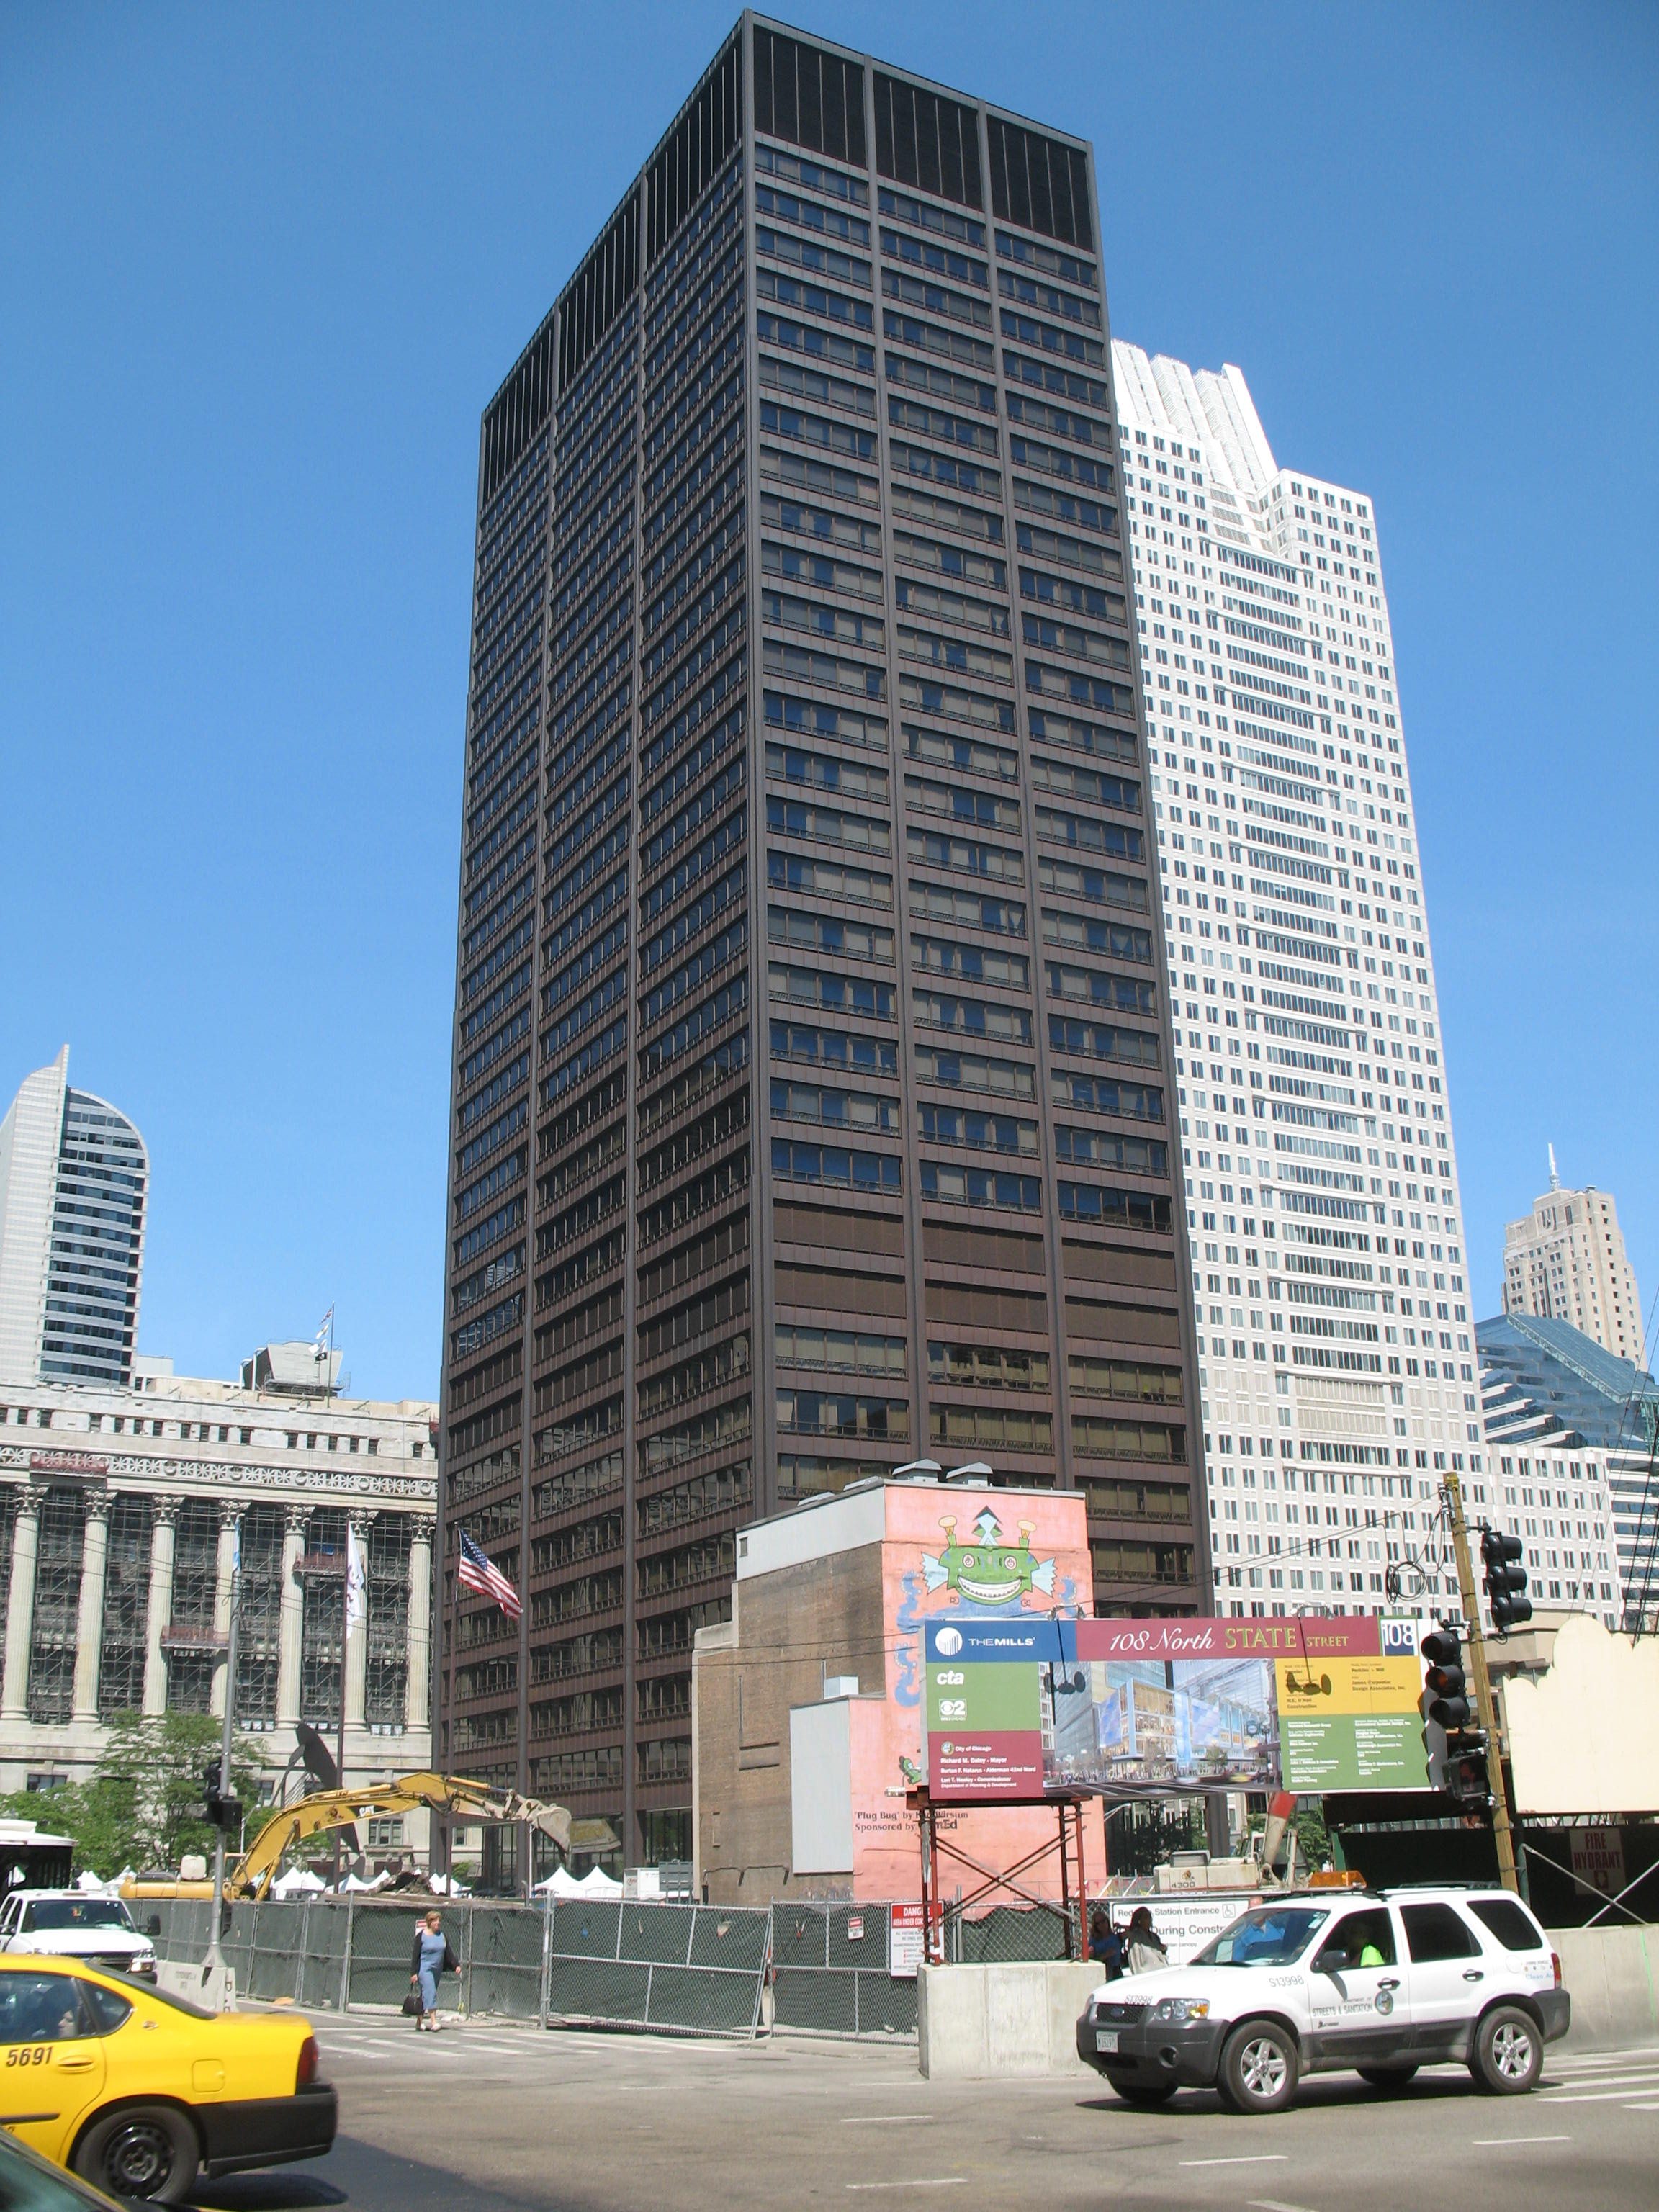 Hotels Near Grants Pab